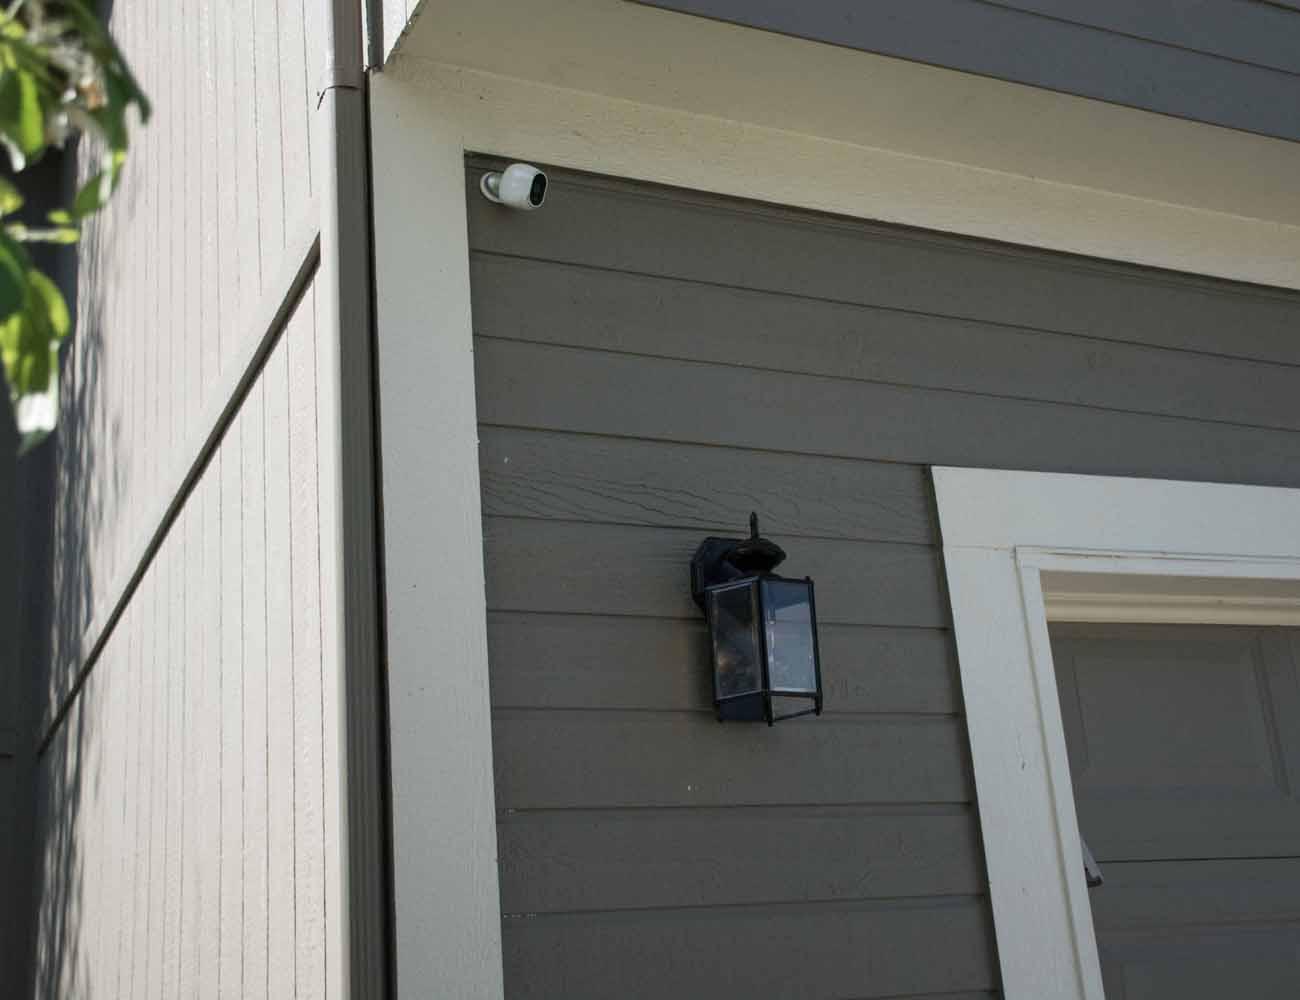 Arlo – Smart Home Security Camera